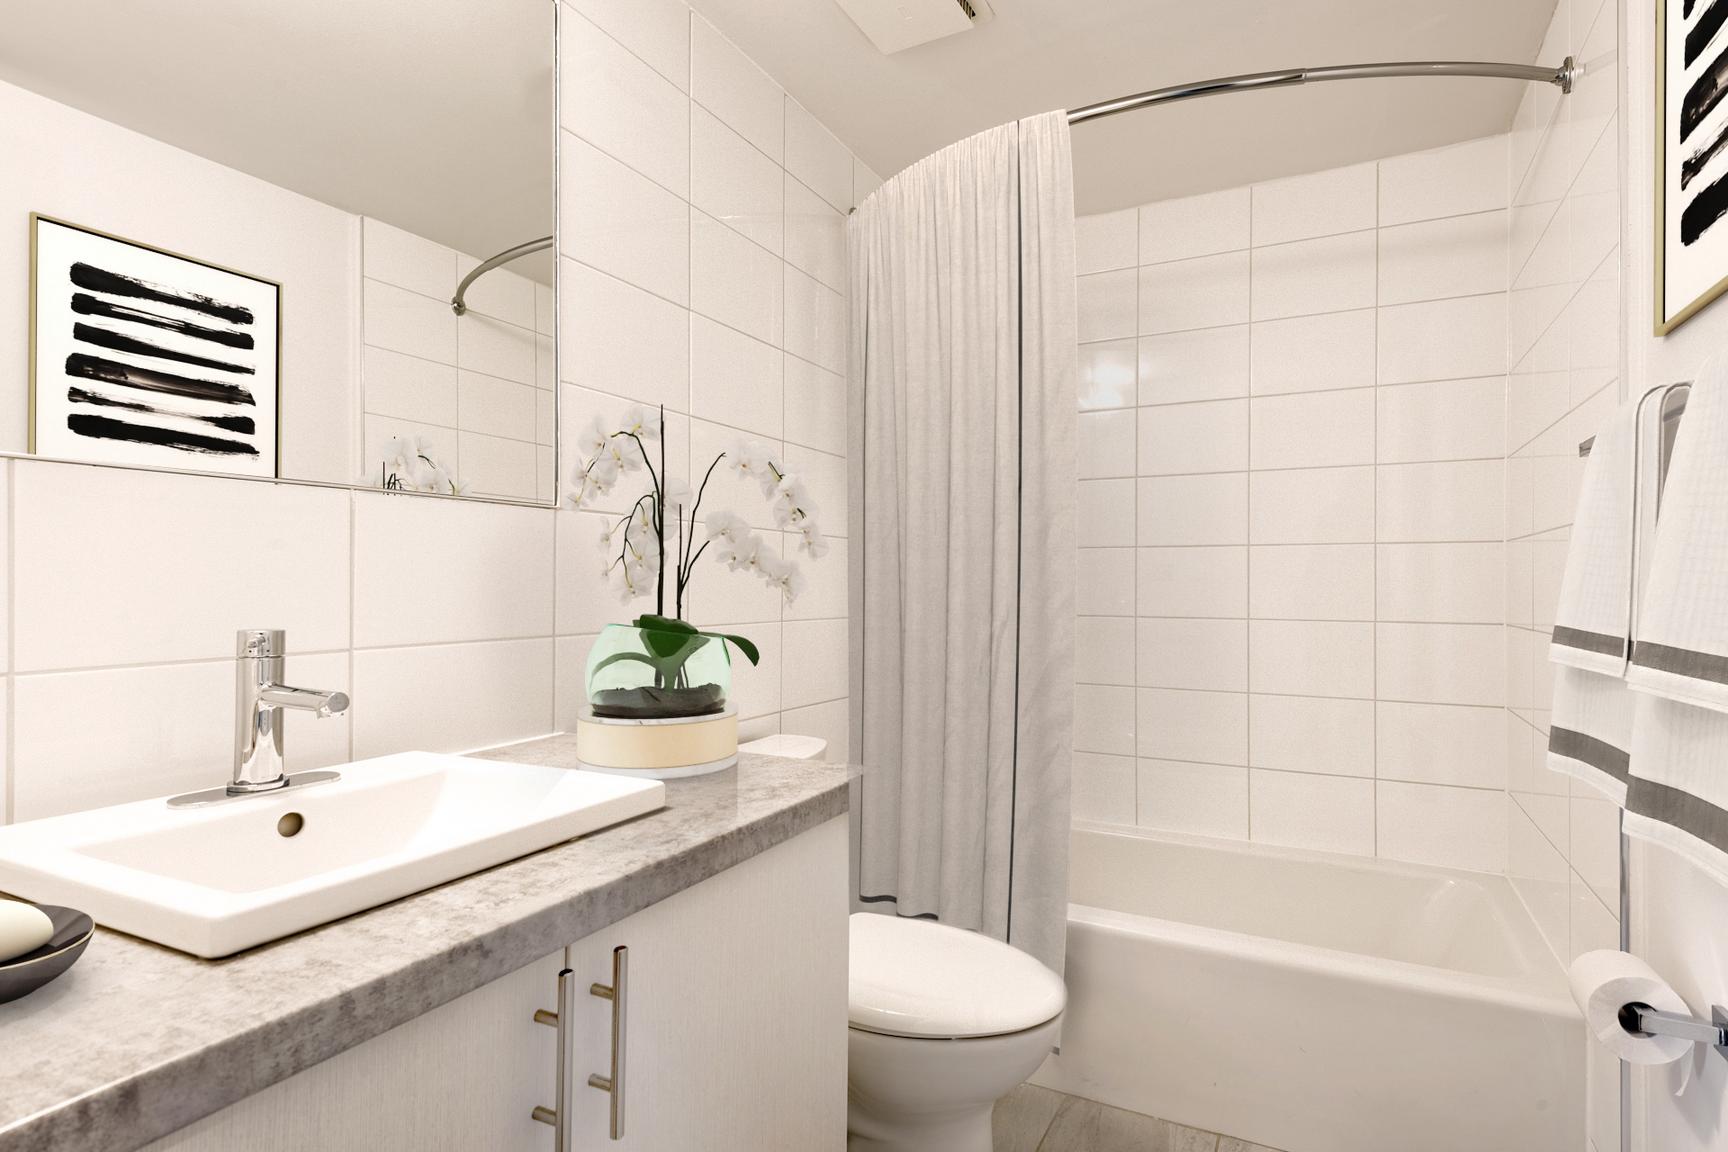 1 bedroom Apartments for rent in Ville St-Laurent - Bois-Franc at Complexe Deguire - Photo 12 - RentQuebecApartments – L407181